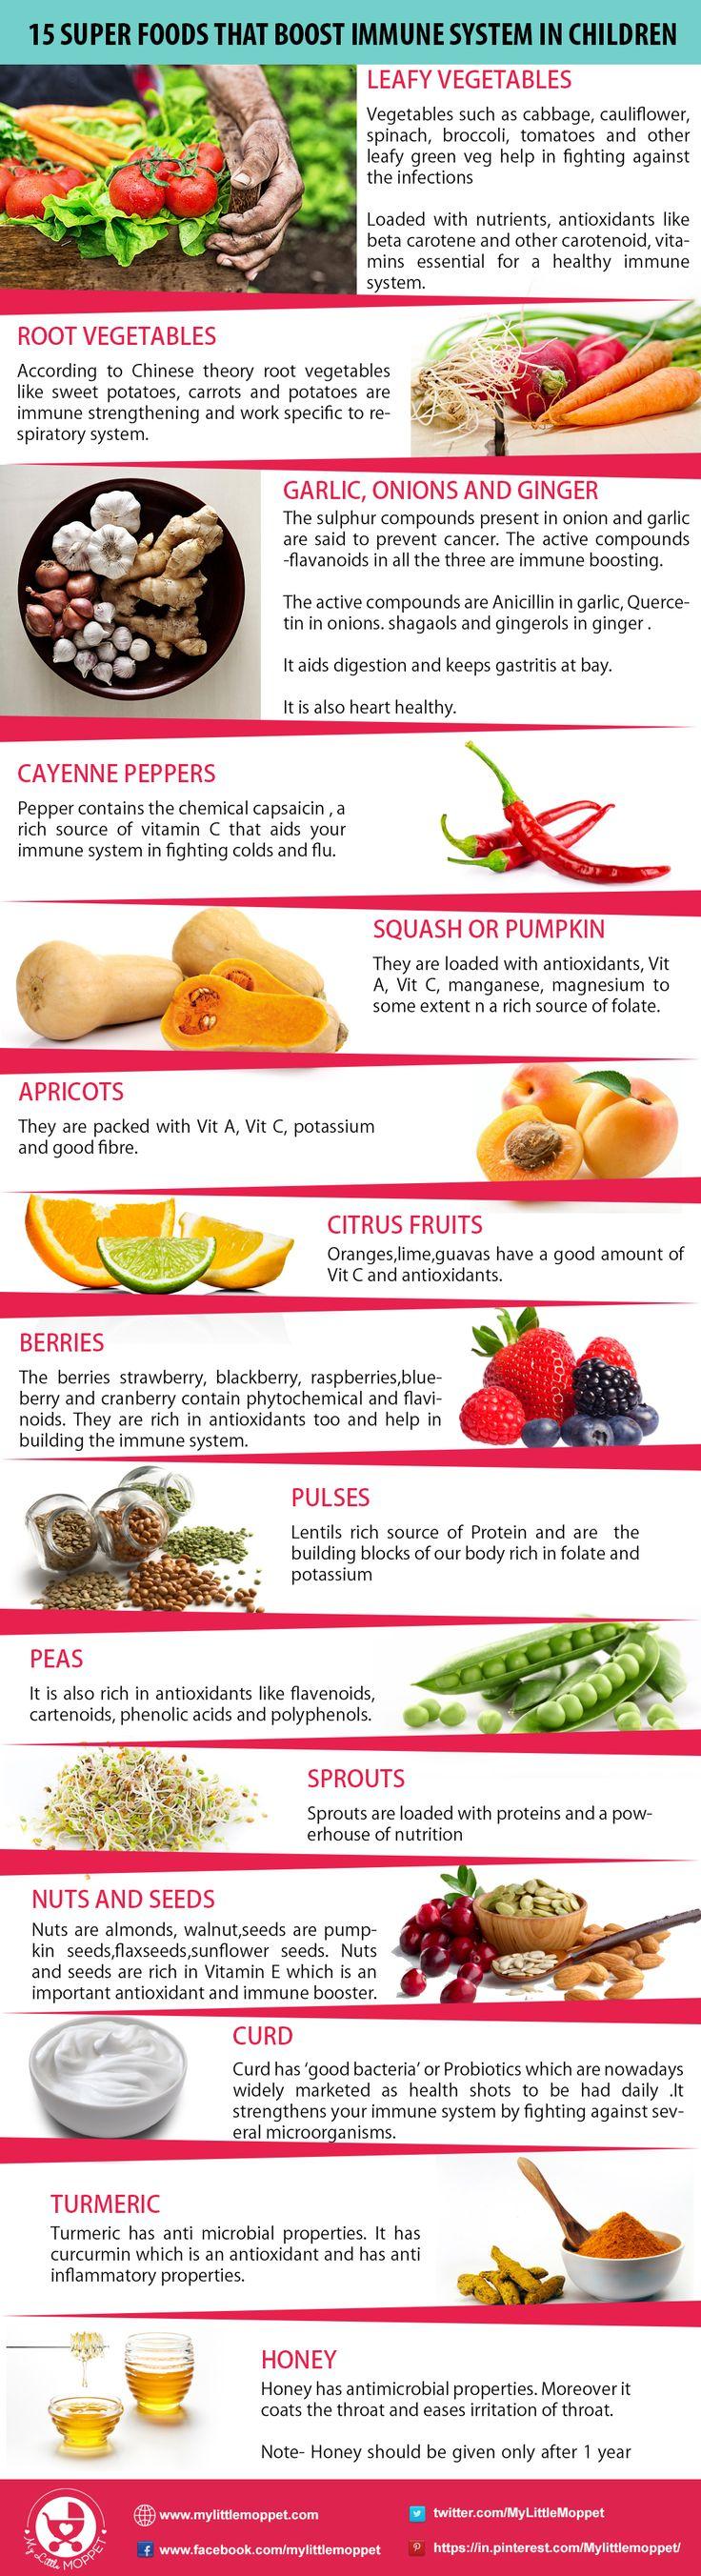 16 Super Foods that Boost Immune System in Children Food